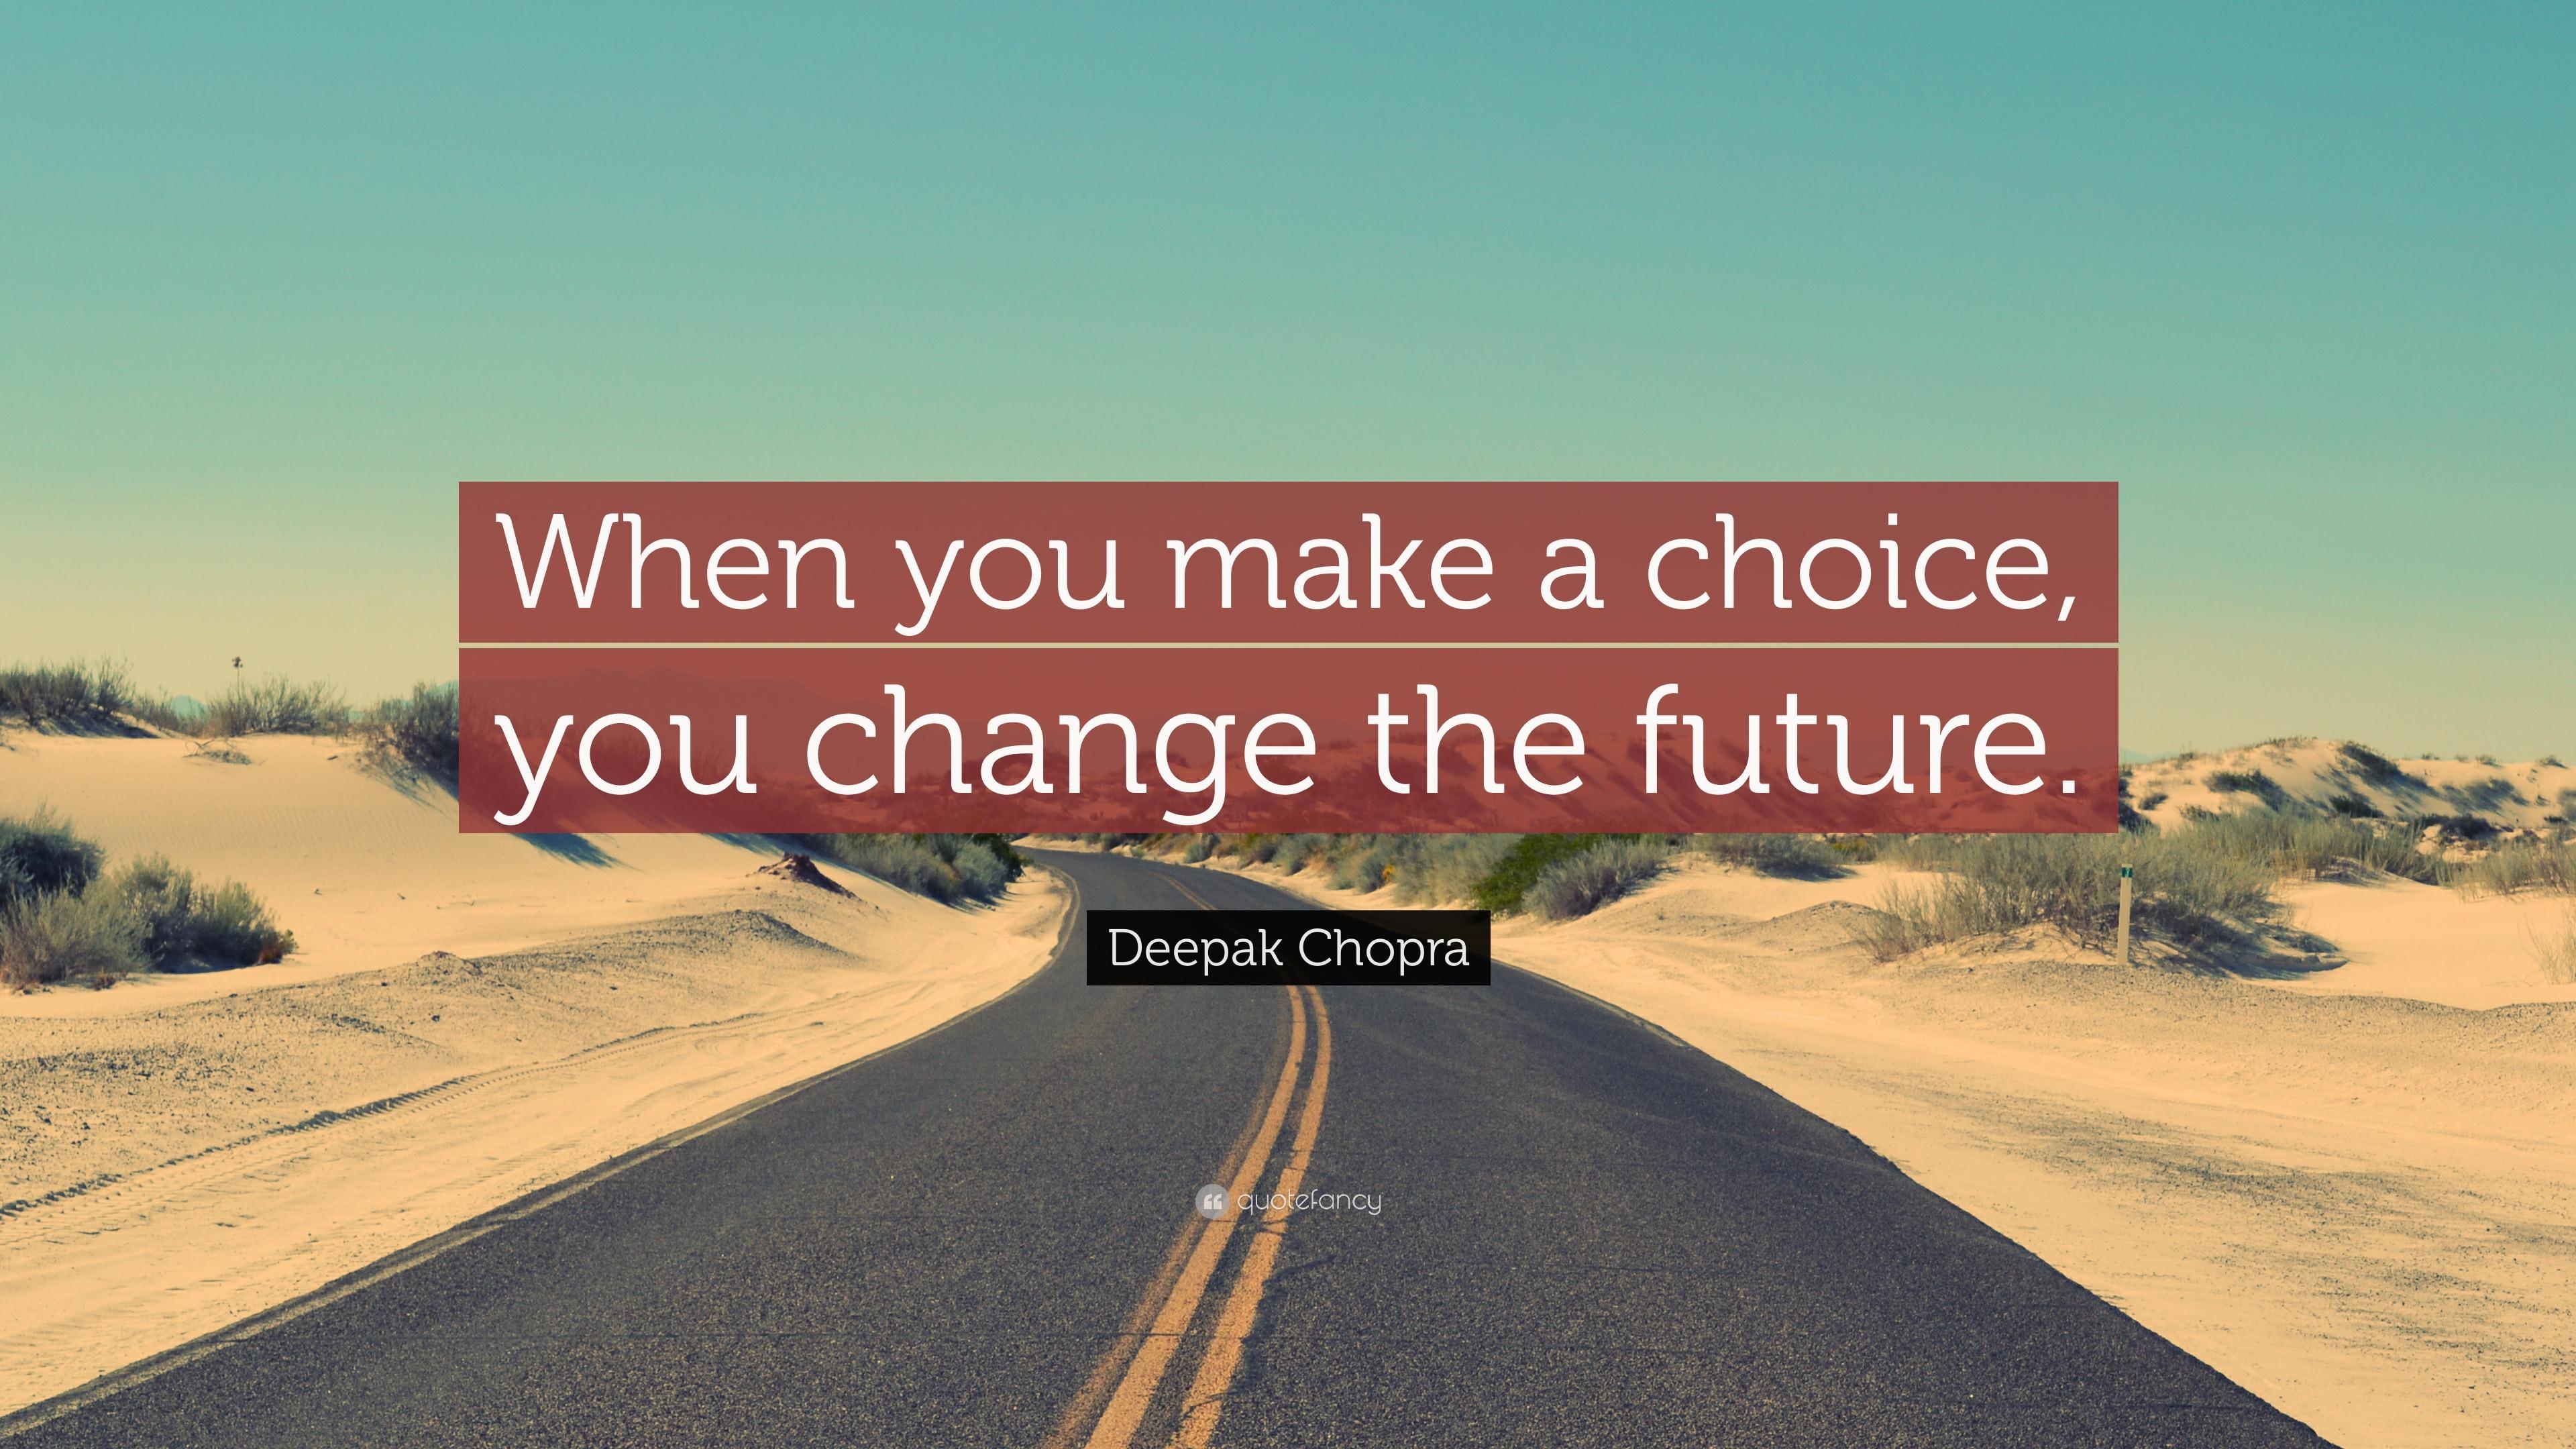 Deepak Chopra Quote When You Make A Choice You Change